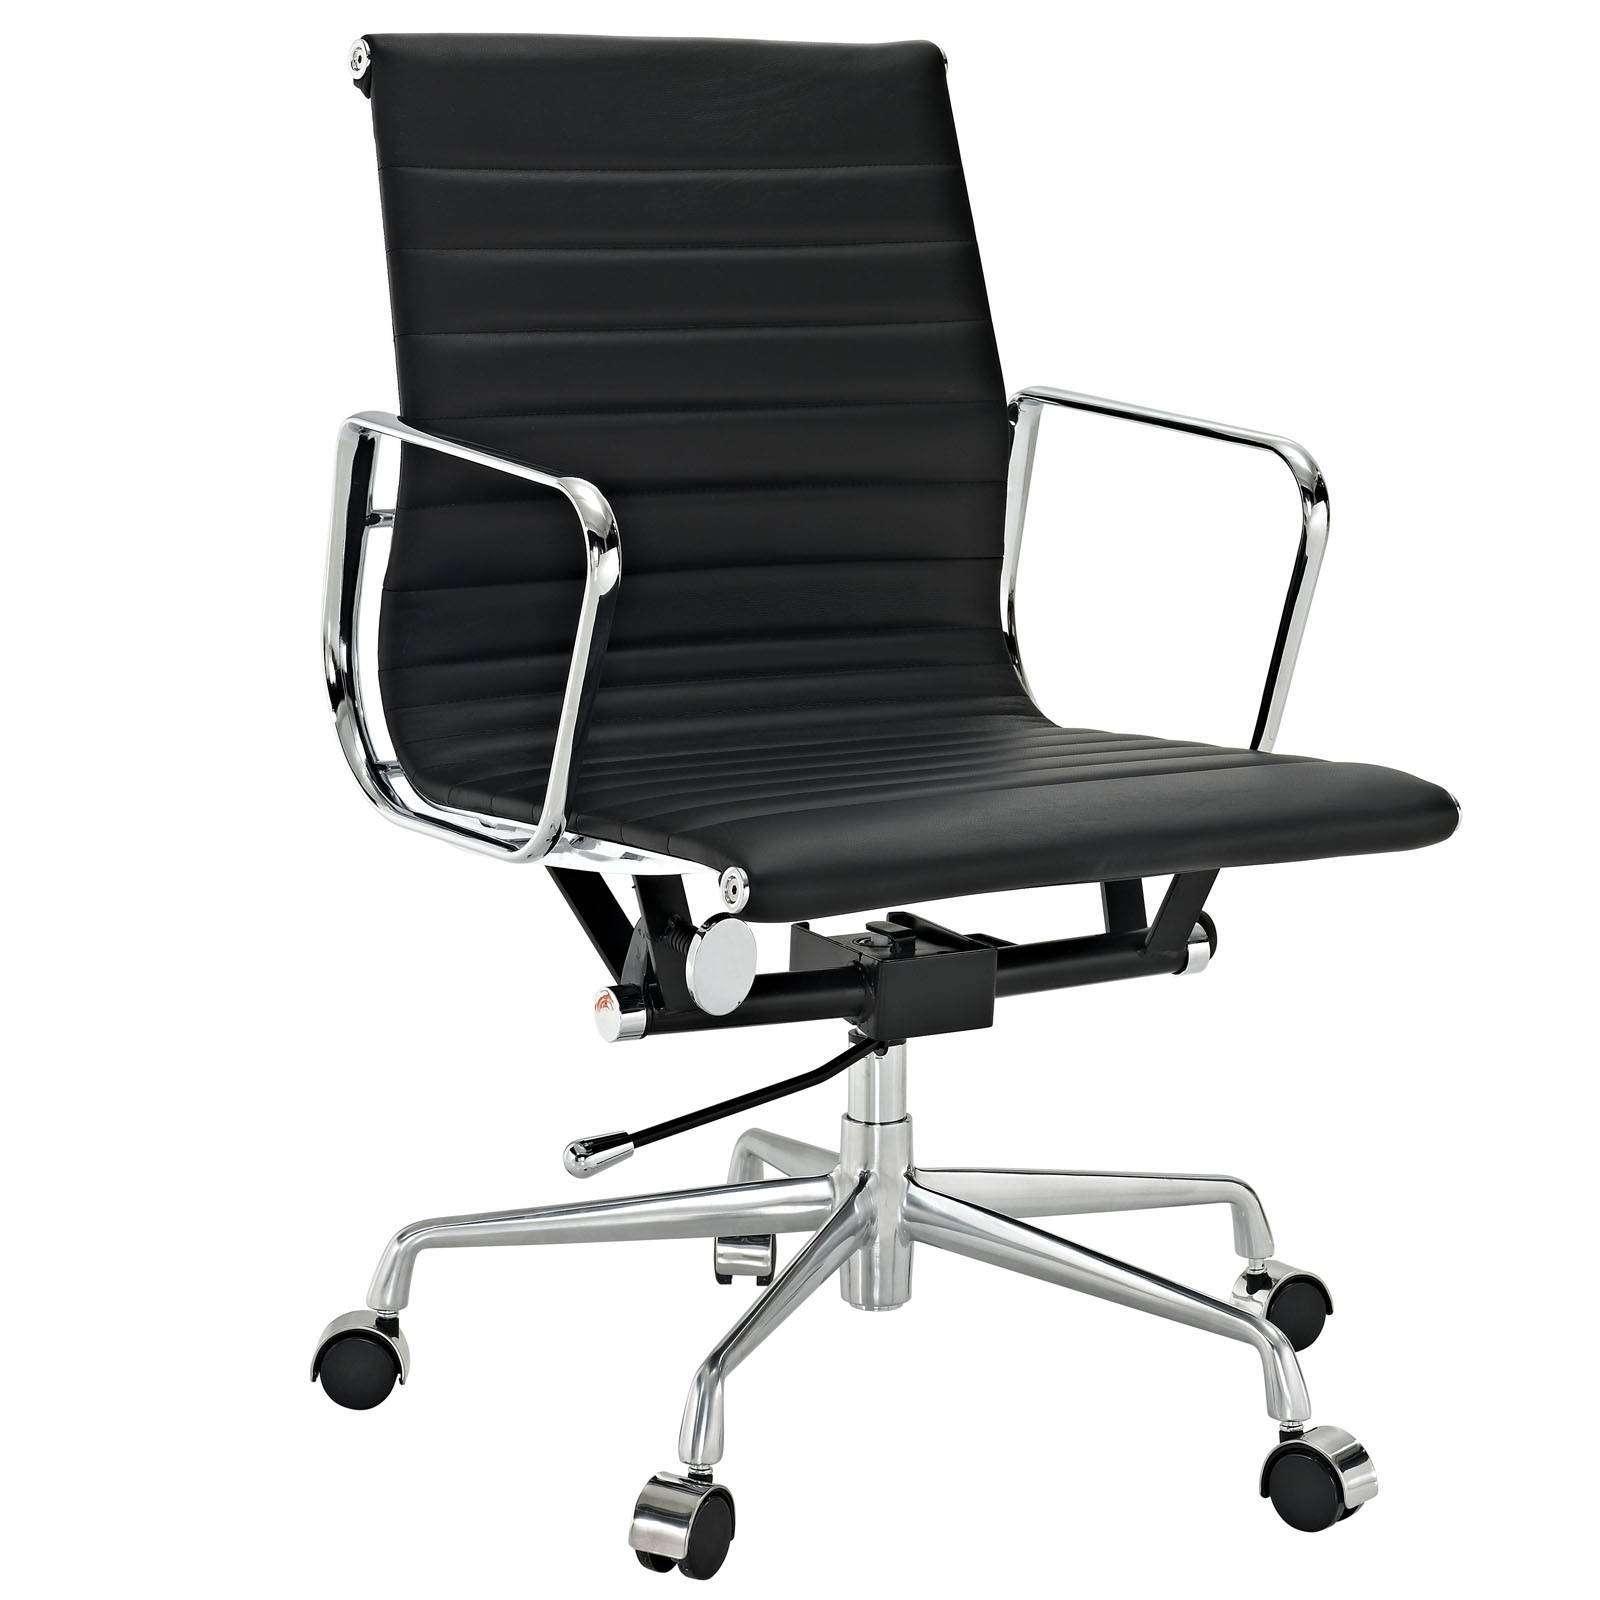 eames aluminum management chair replica rocker es game office - style   modterior